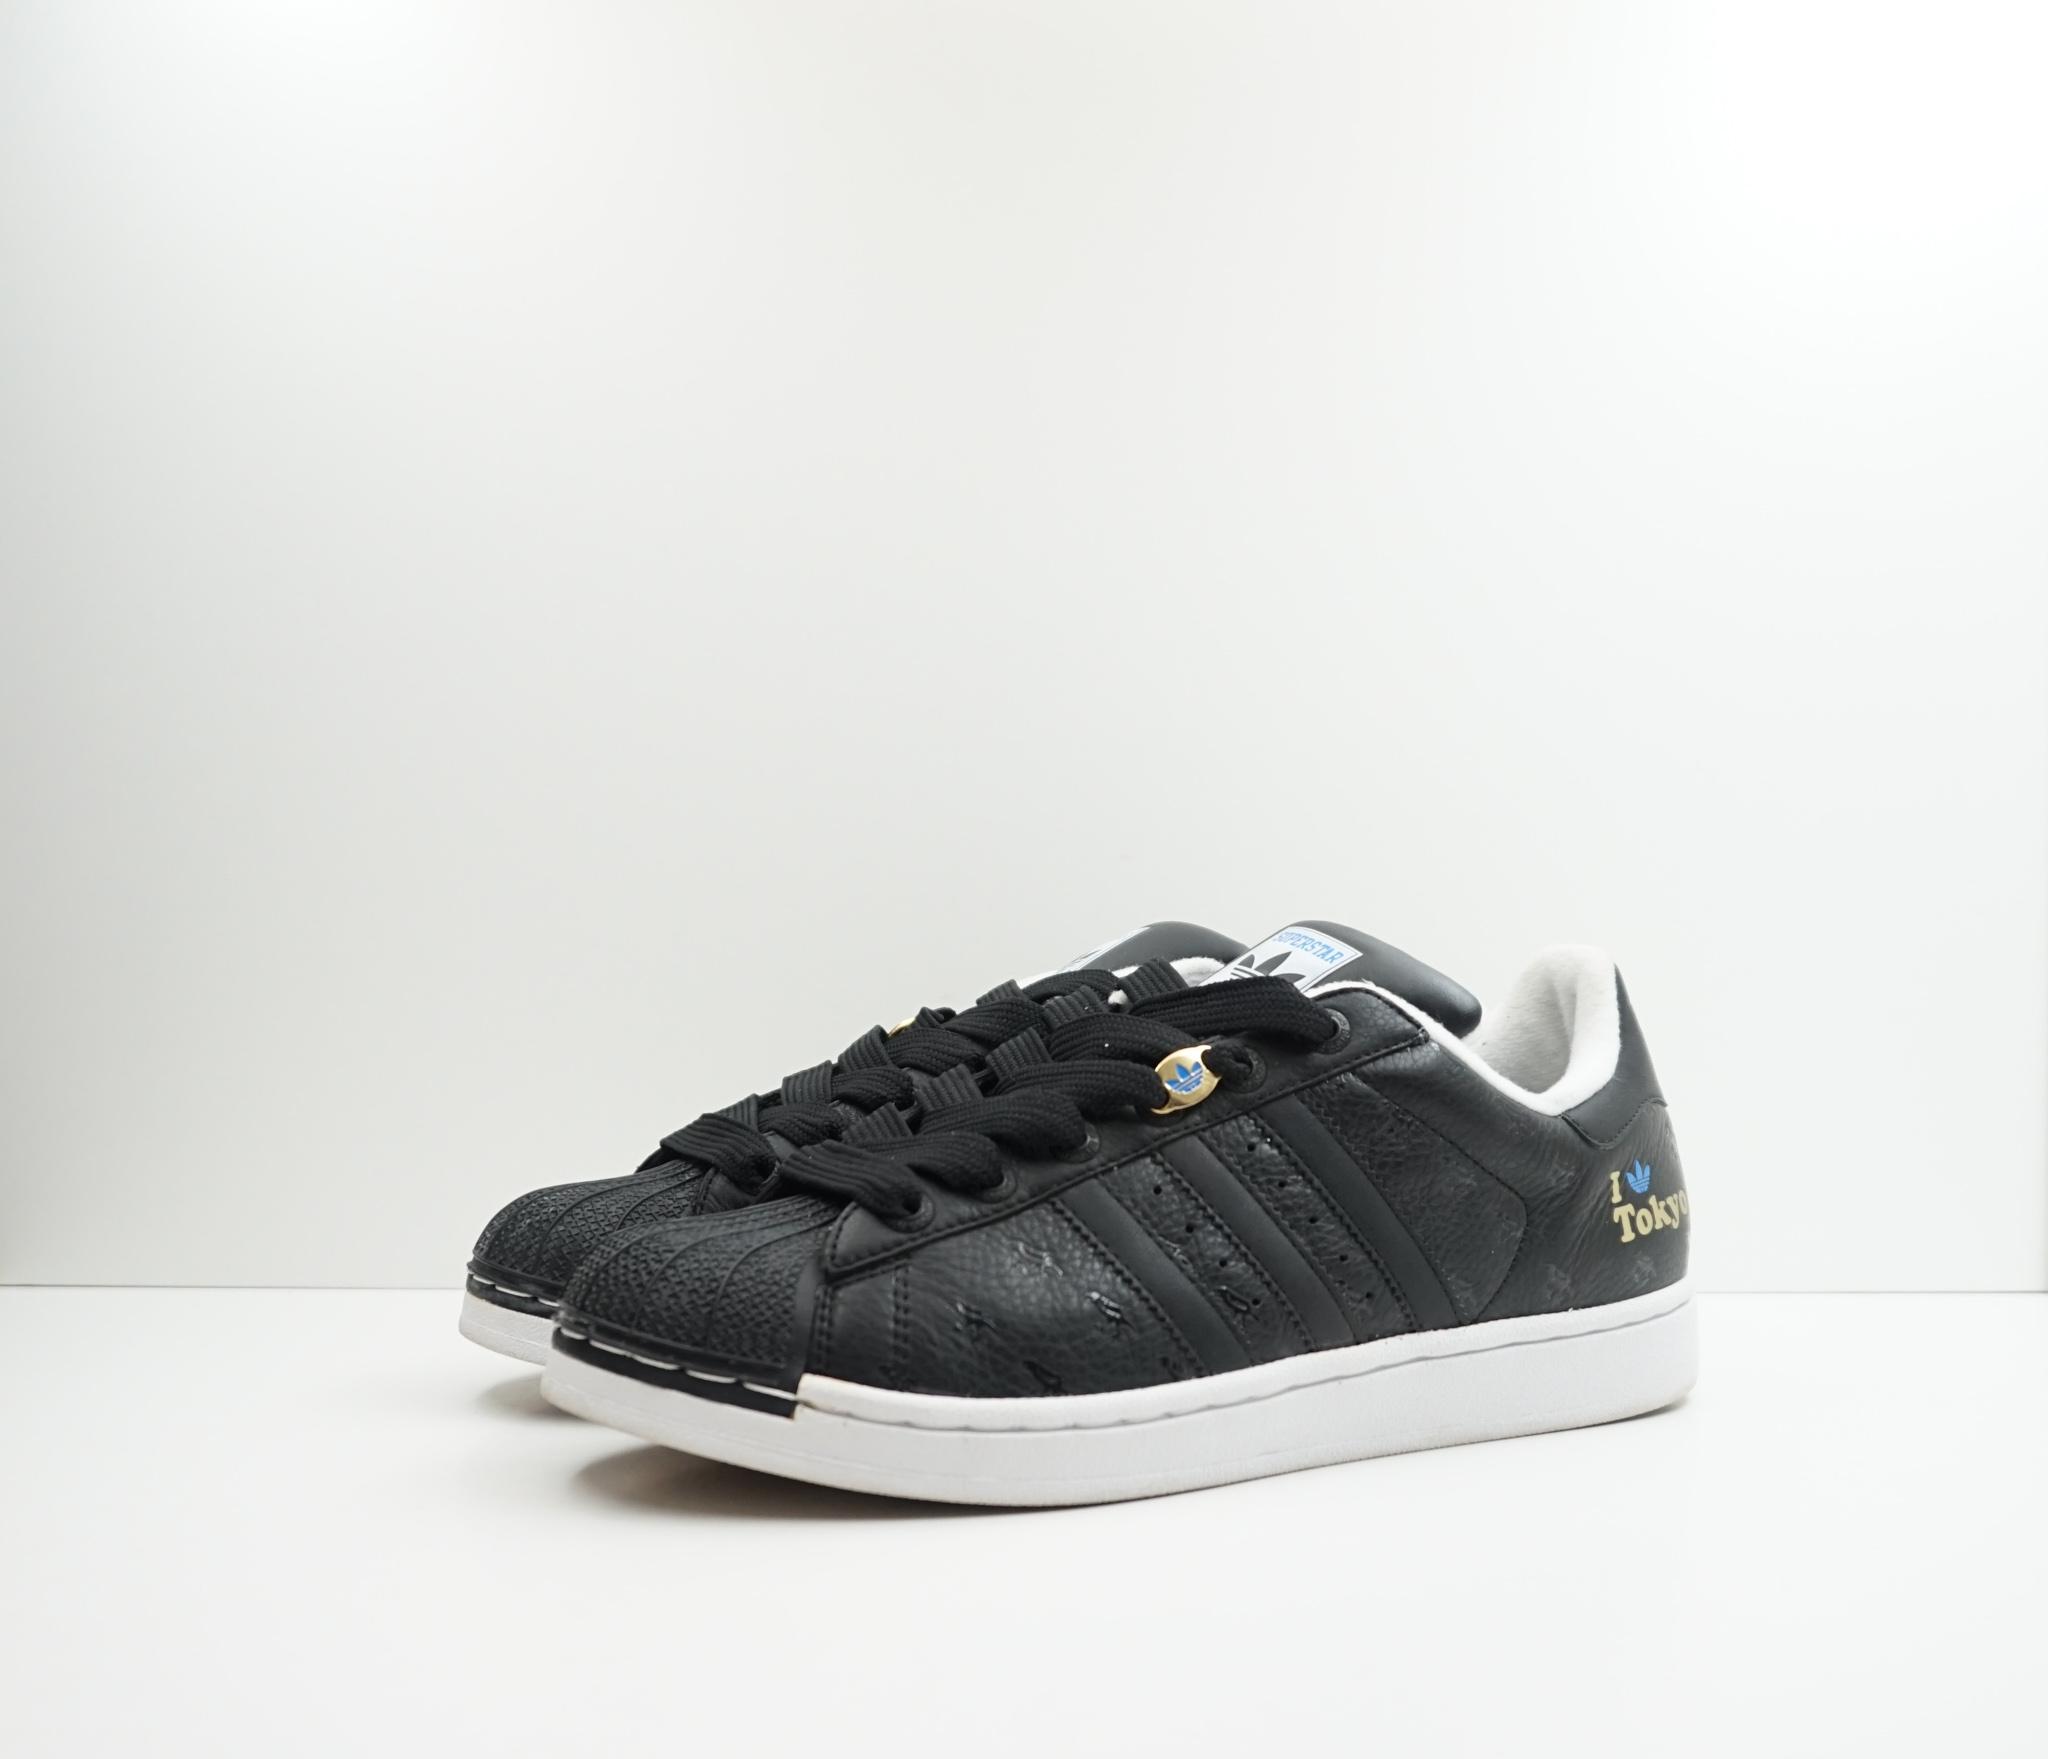 Adidas Superstar 2 City Version 'Tokyo'